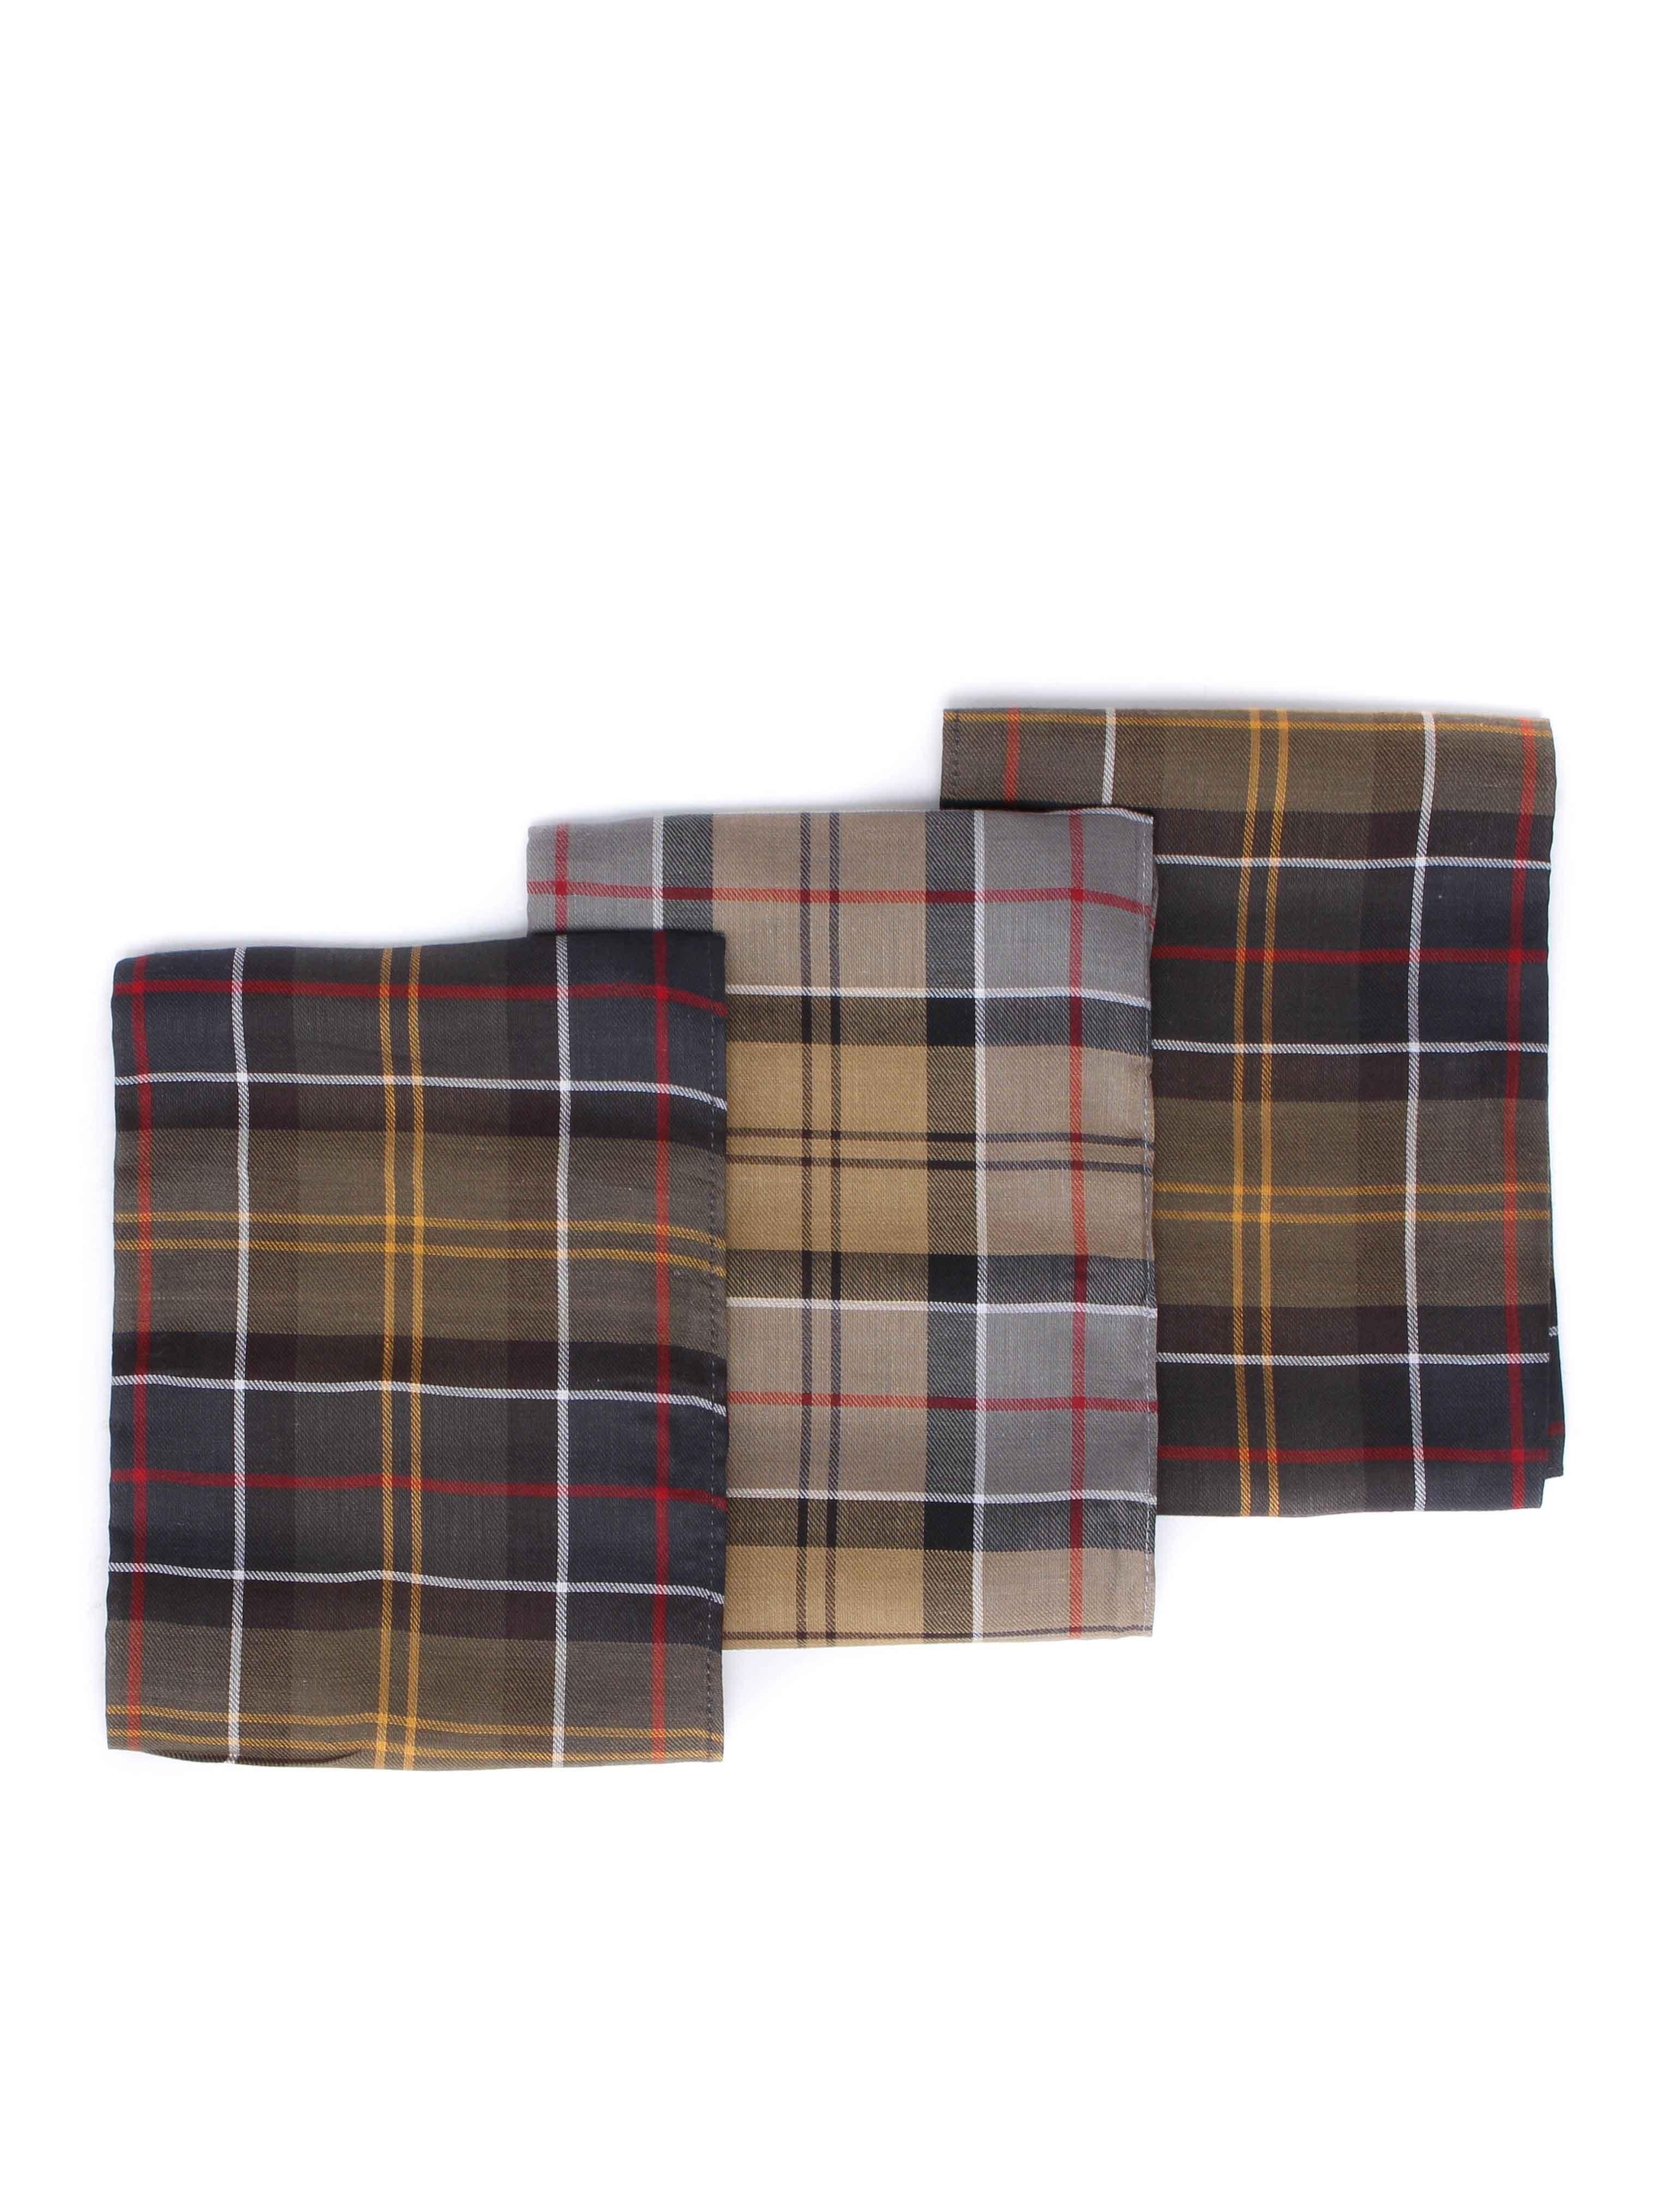 Barbour 3 Pack Tartan Cotton Pocket Squares